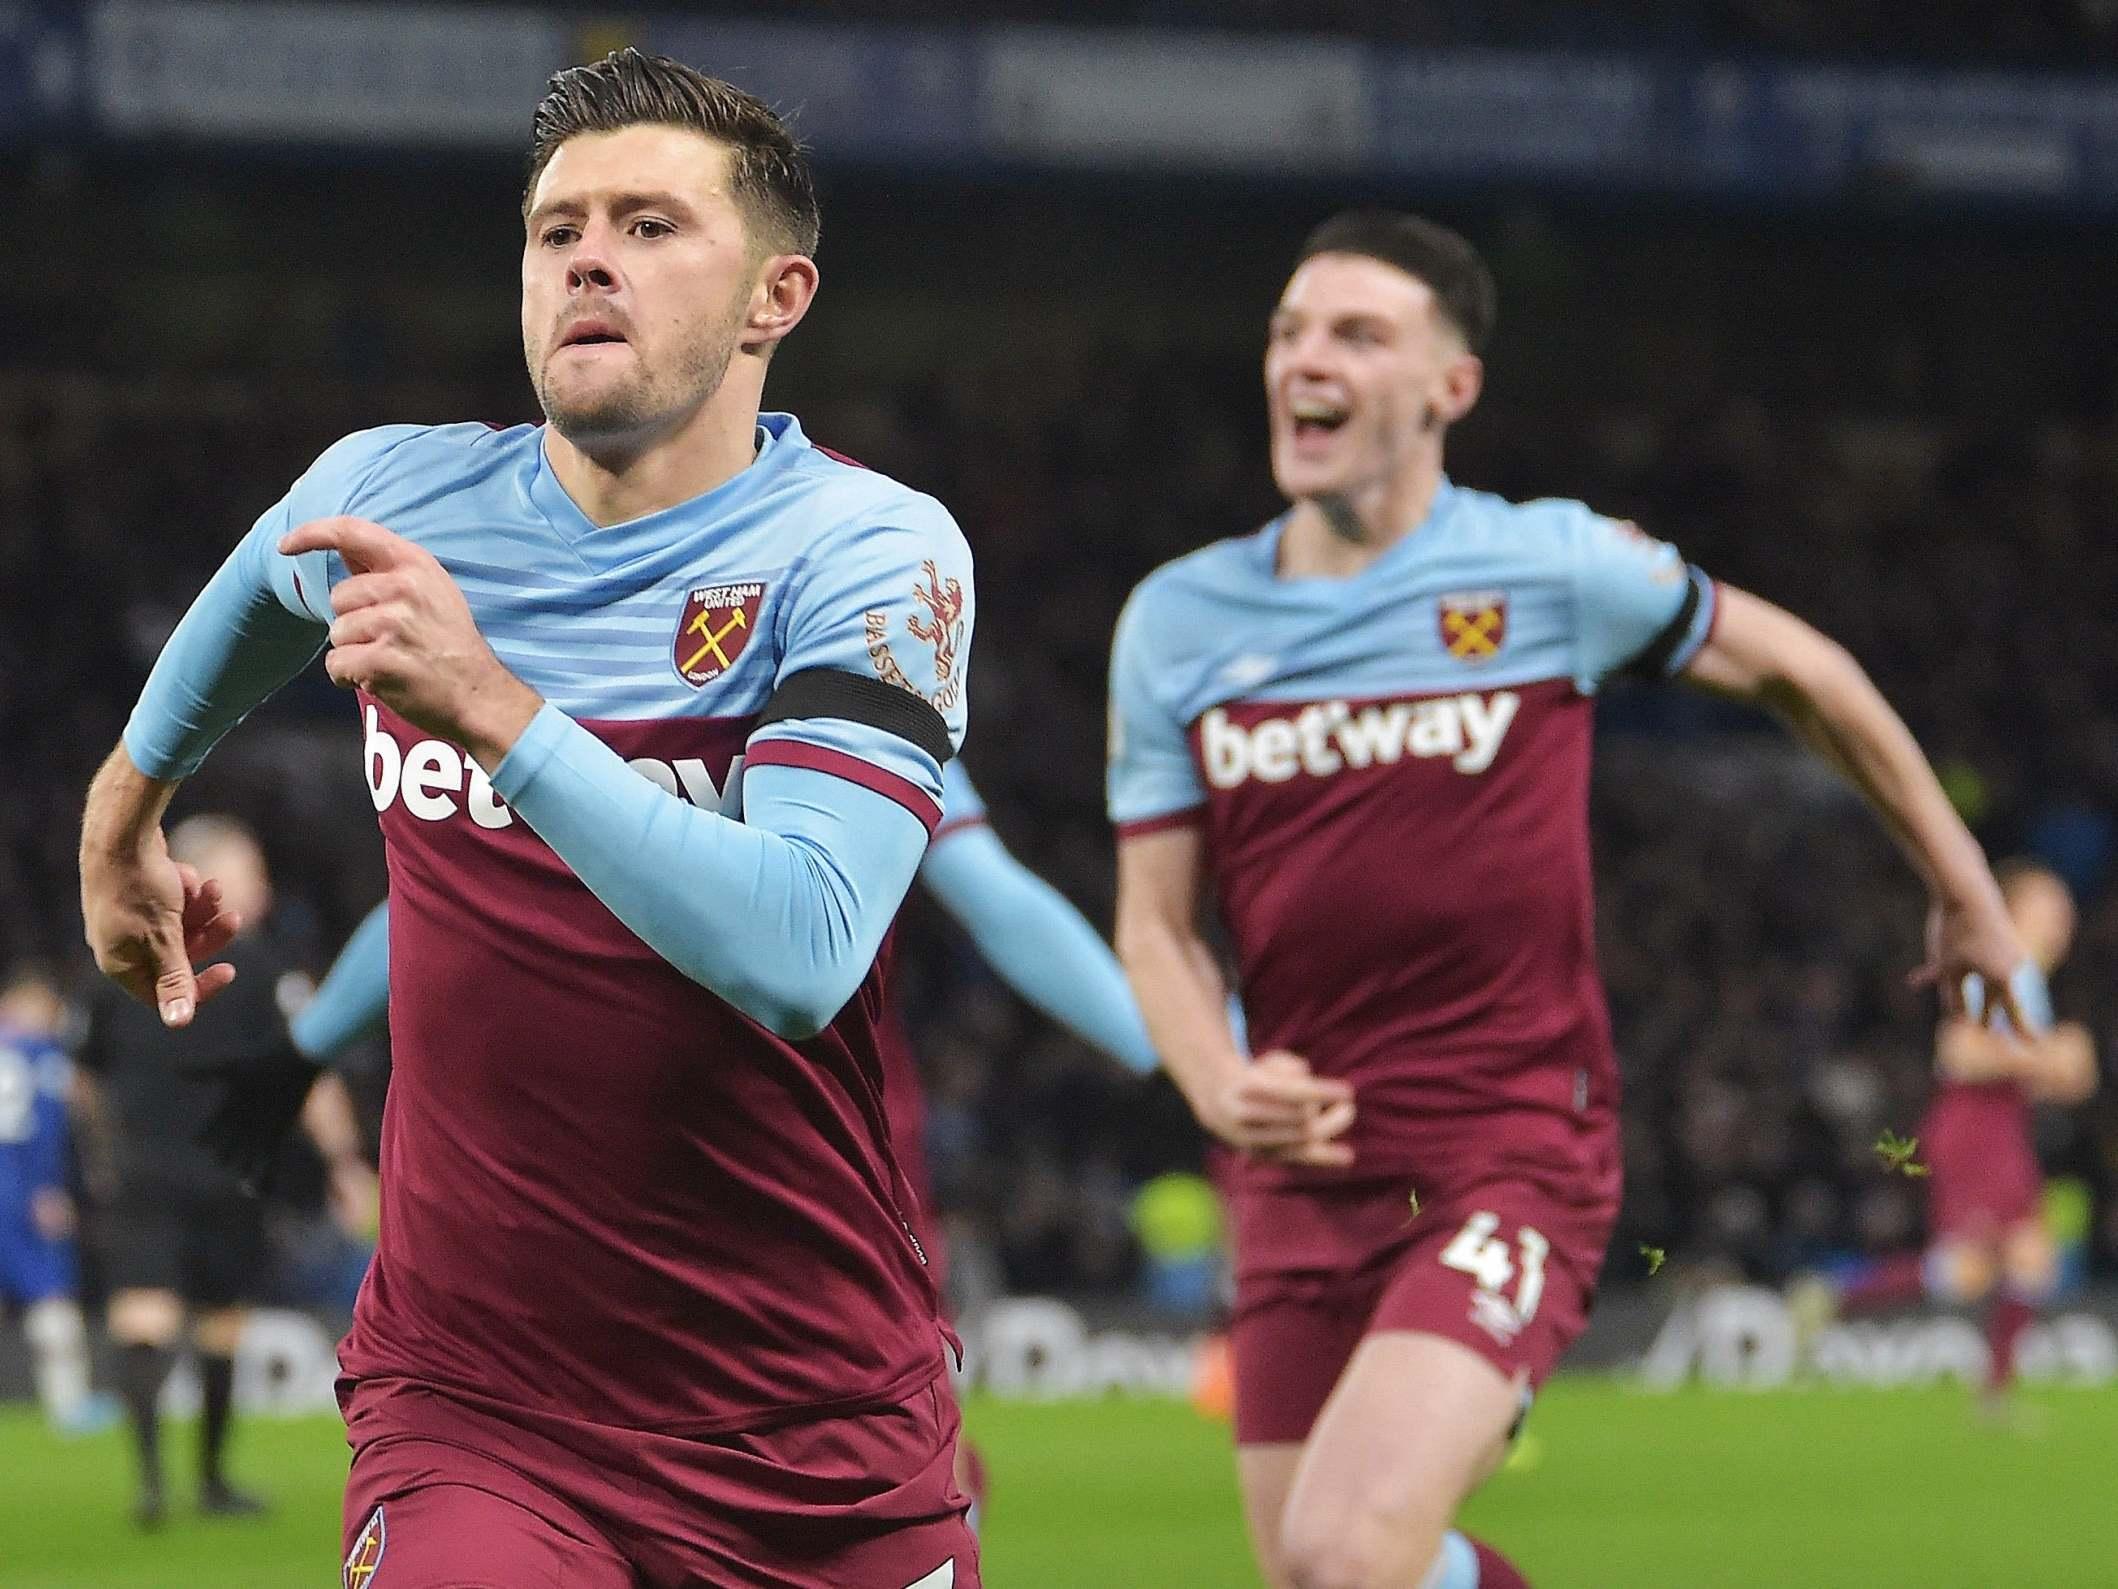 West Ham vs Chelsea predicted line-ups: Team news ahead Premier League fixture tonight thumbnail